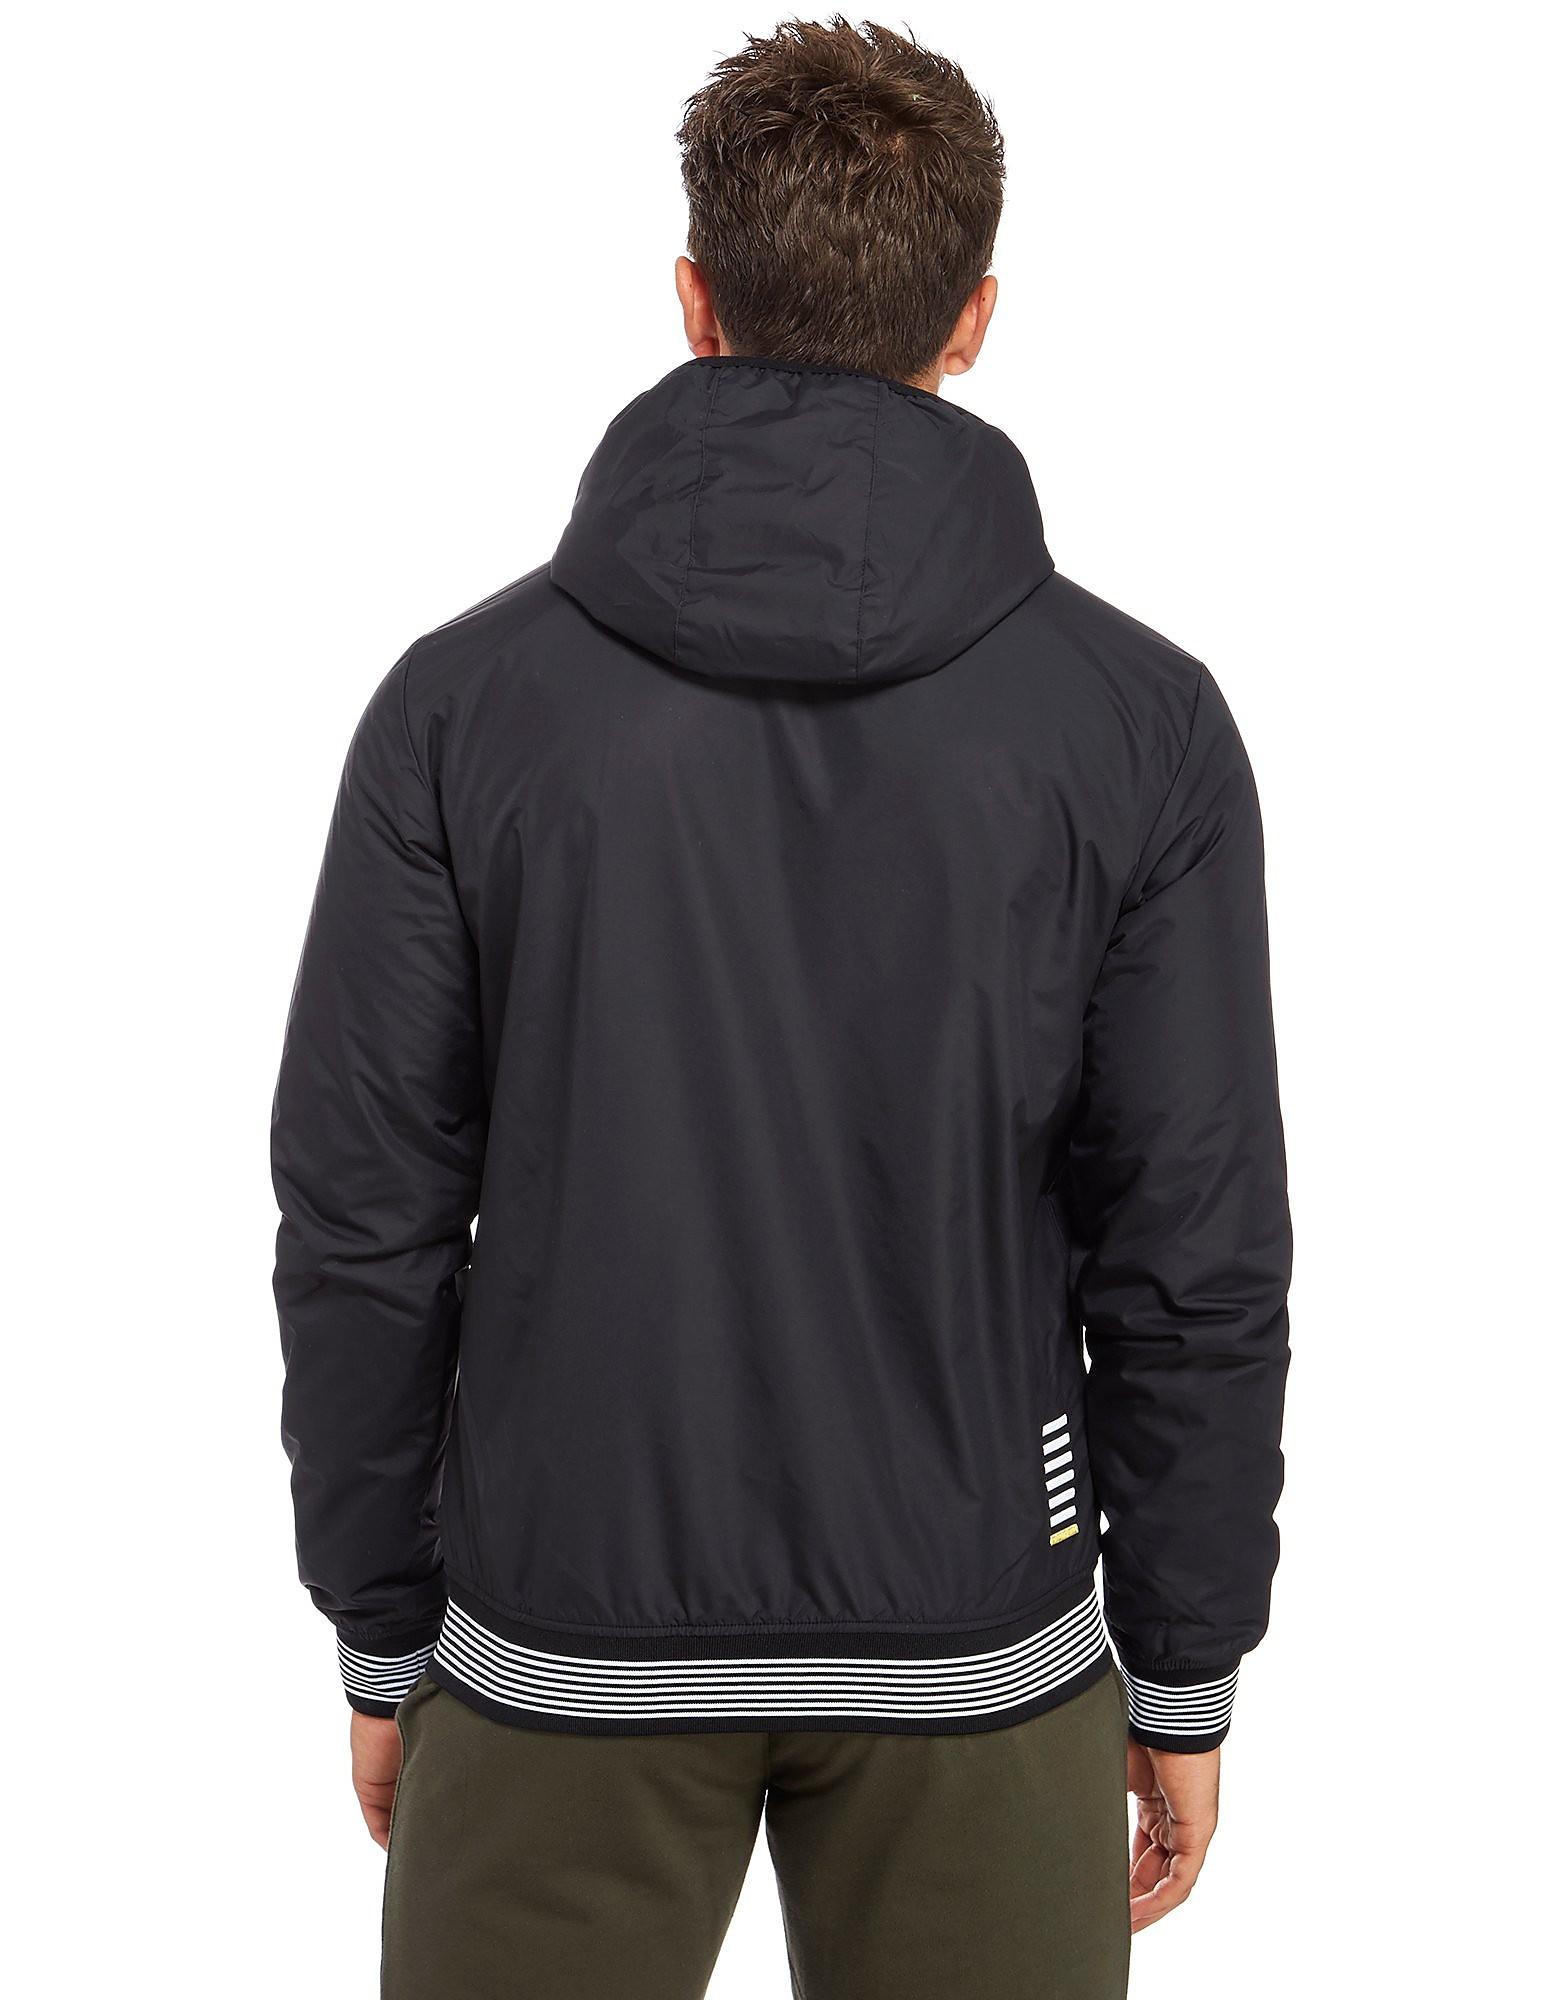 Emporio Armani EA7 Hooded Sailing Jacket